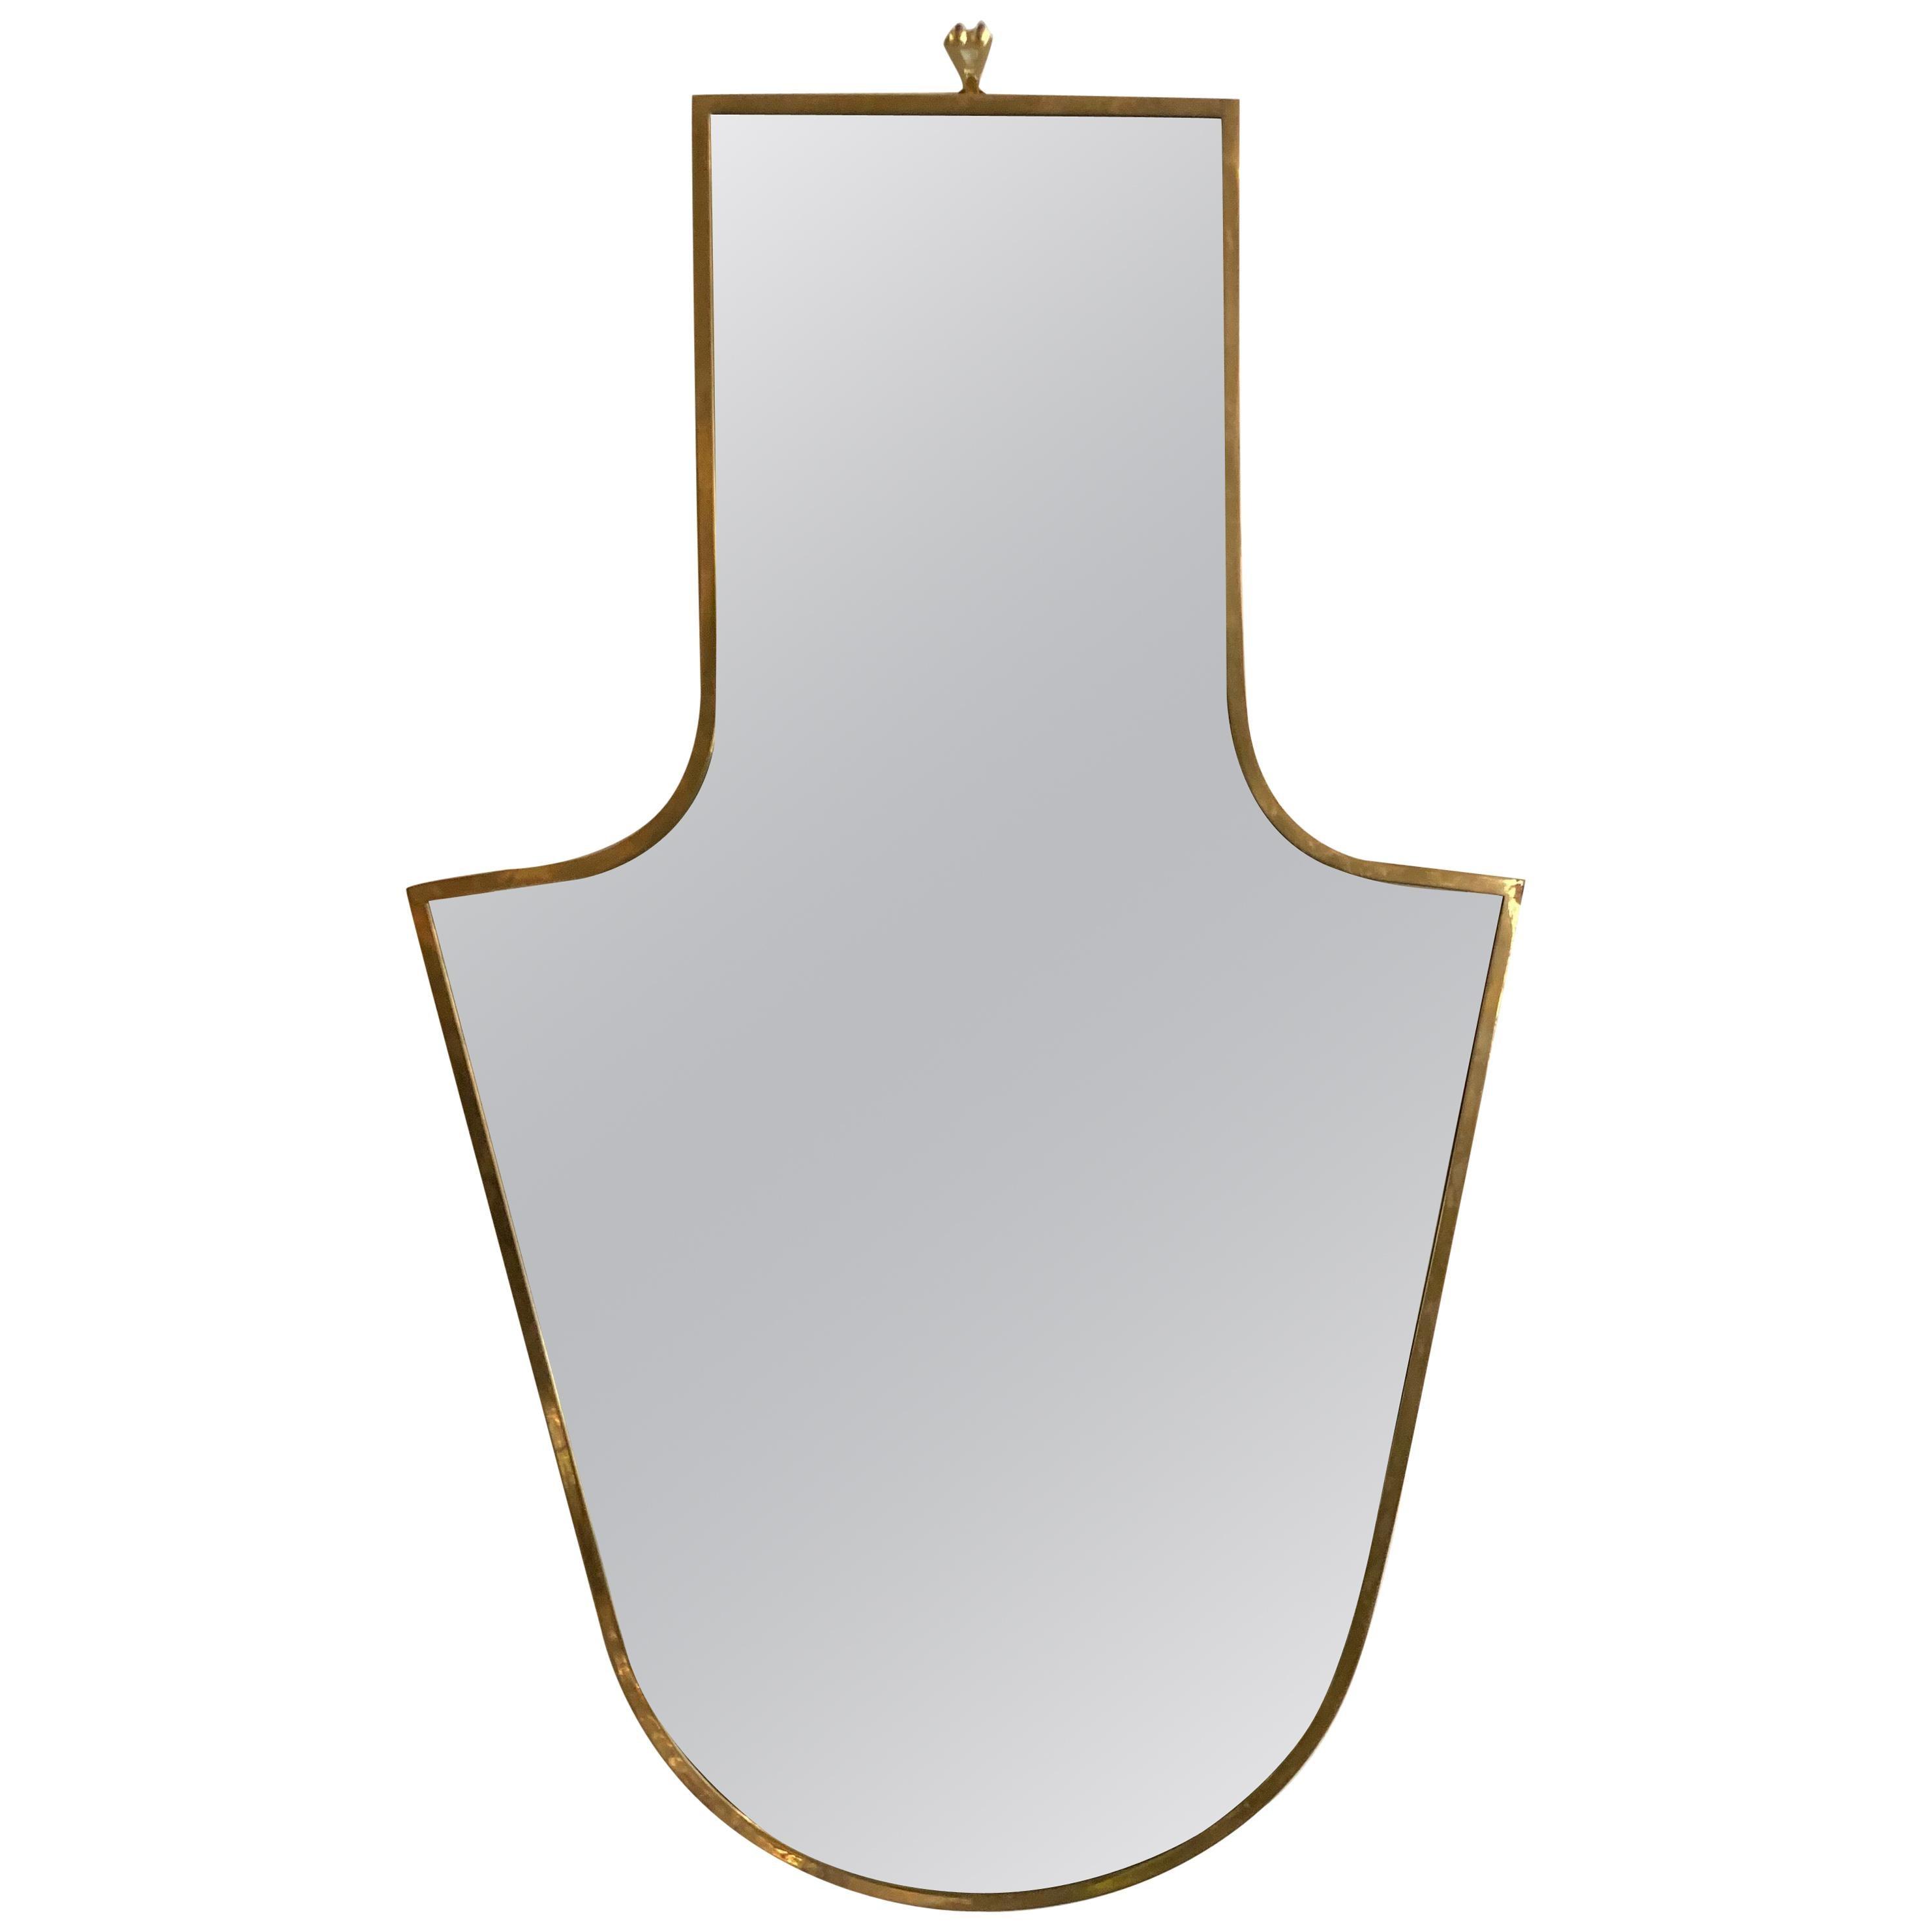 Italian Modern Shaped Brass Framed Mirror